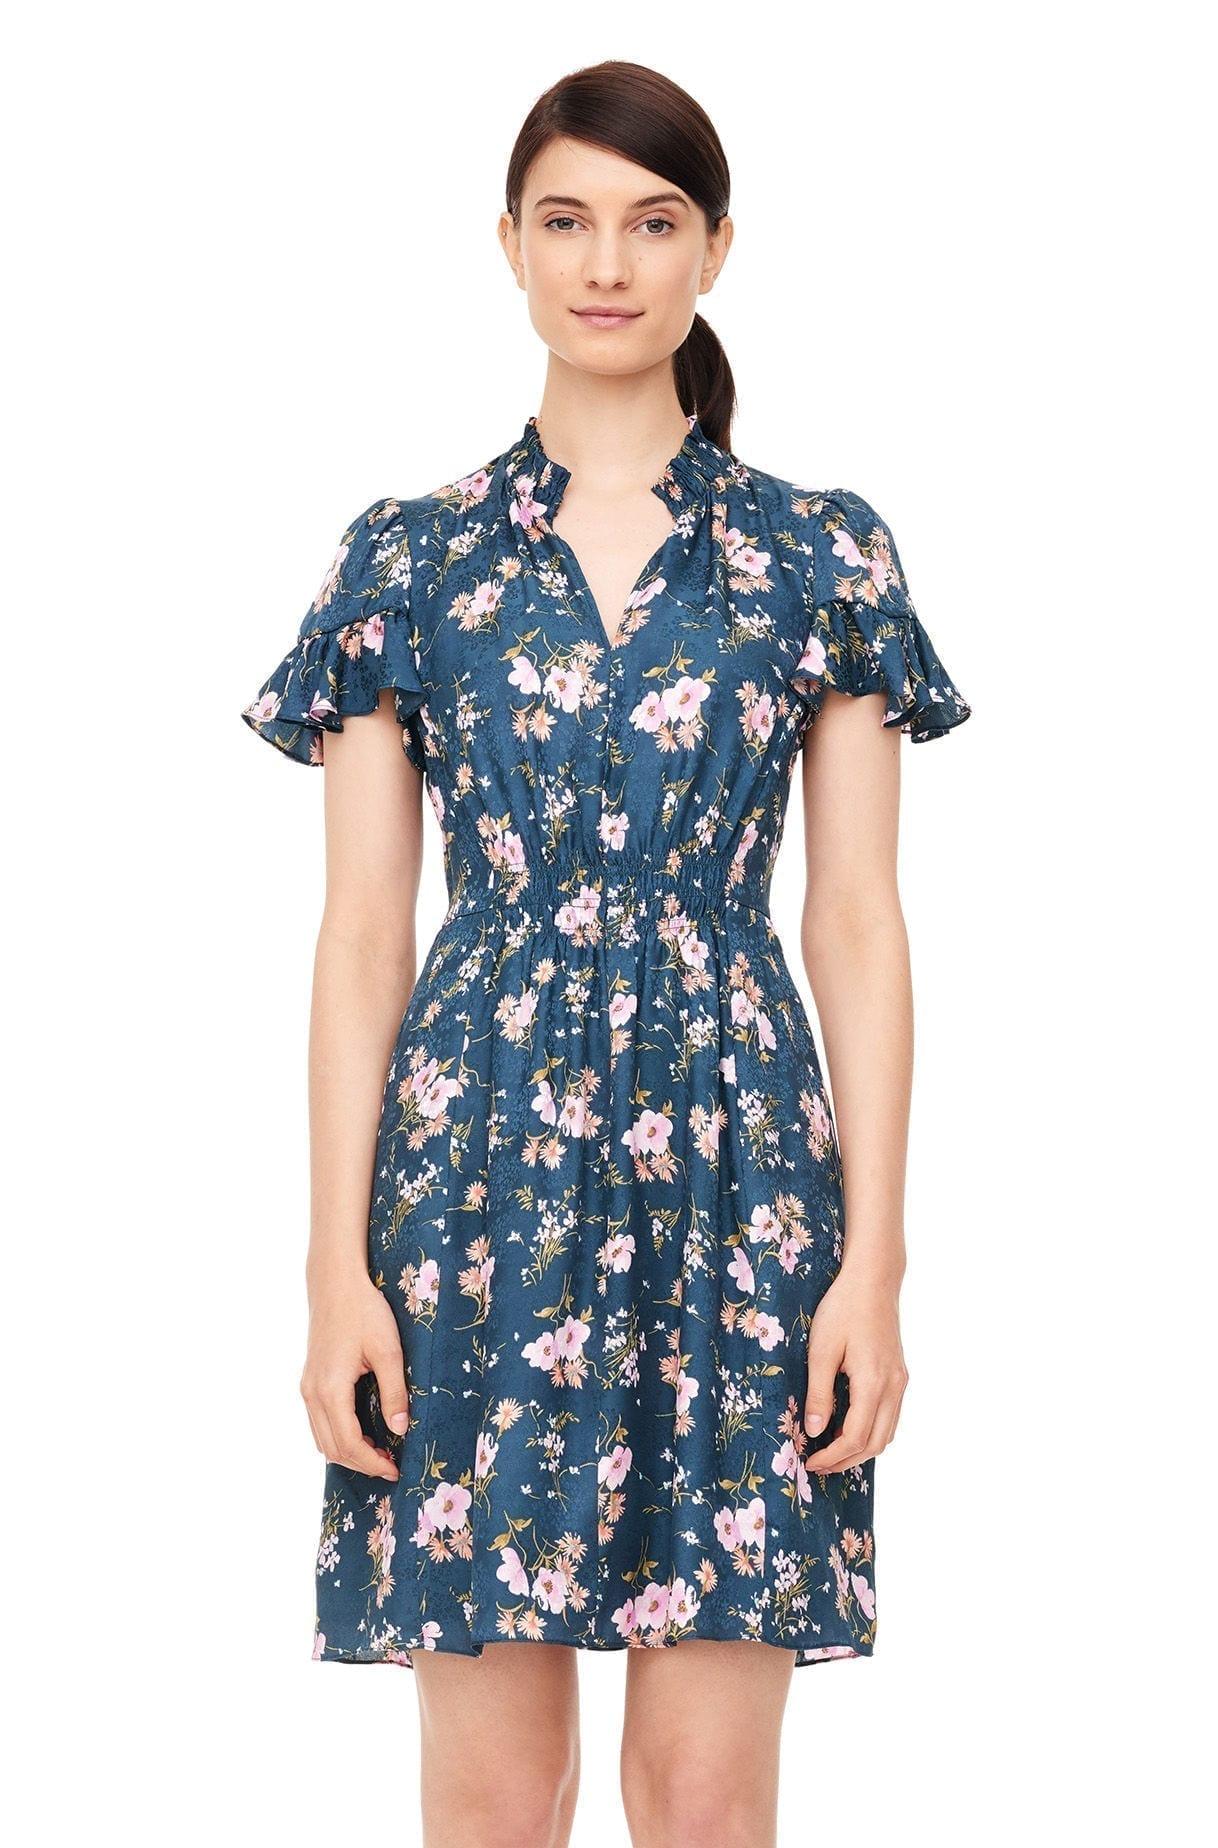 Rebecca Taylor Emilia Print Silk Jacquard Teal Dress